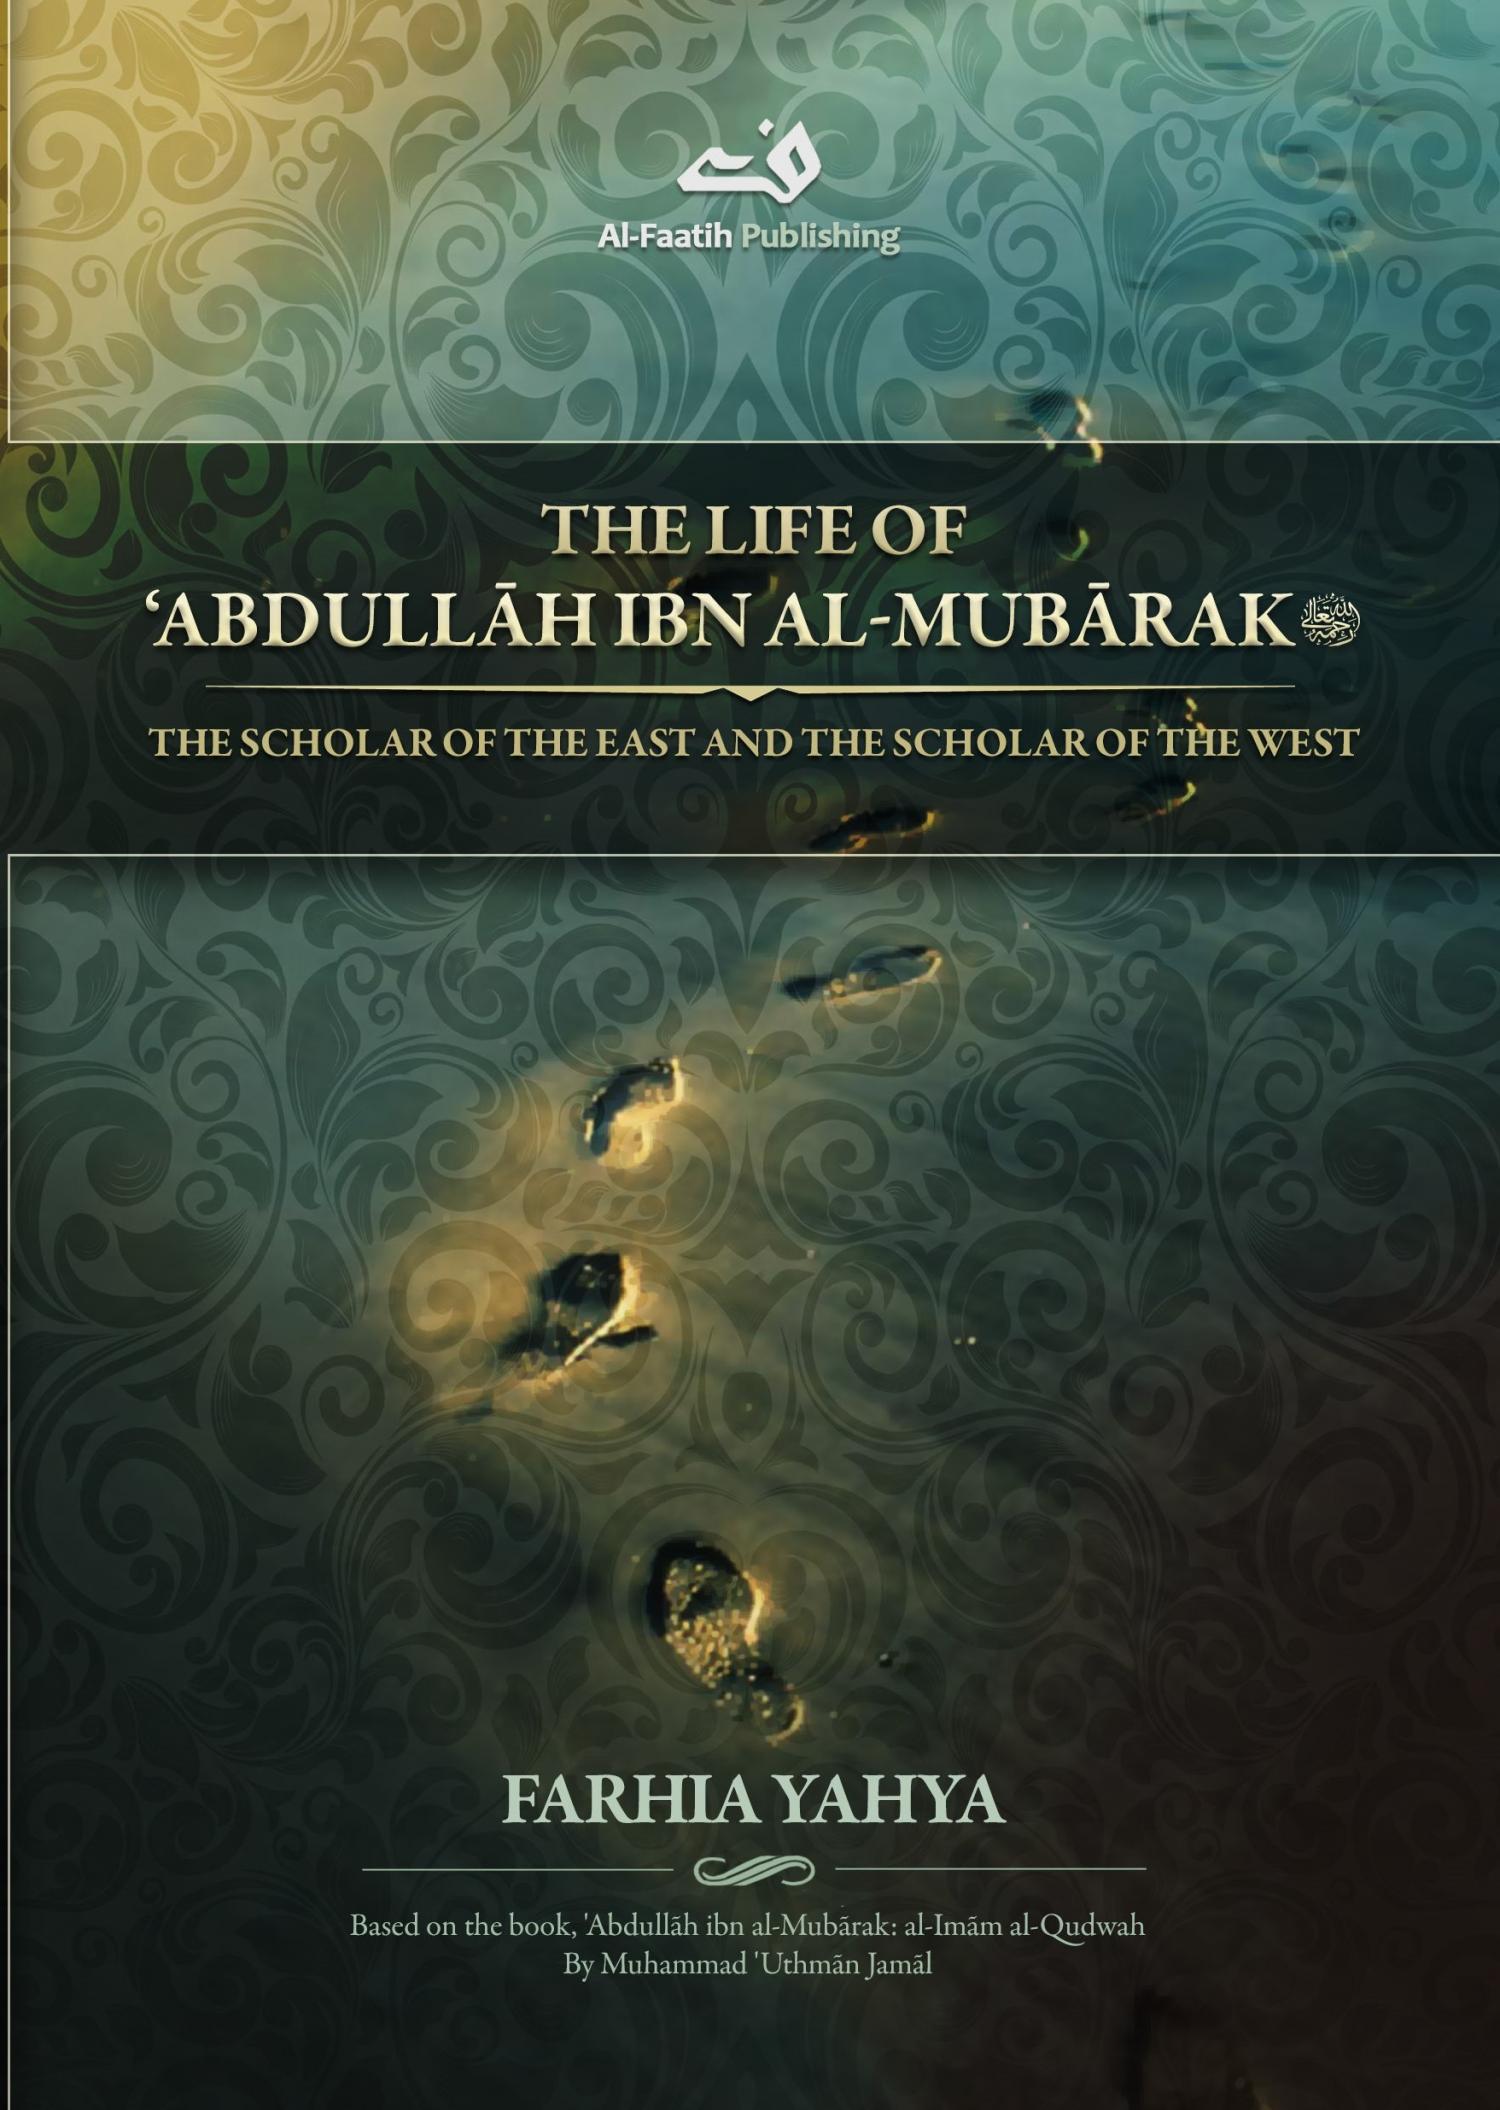 The Life of Abdullah ibn Mubarak